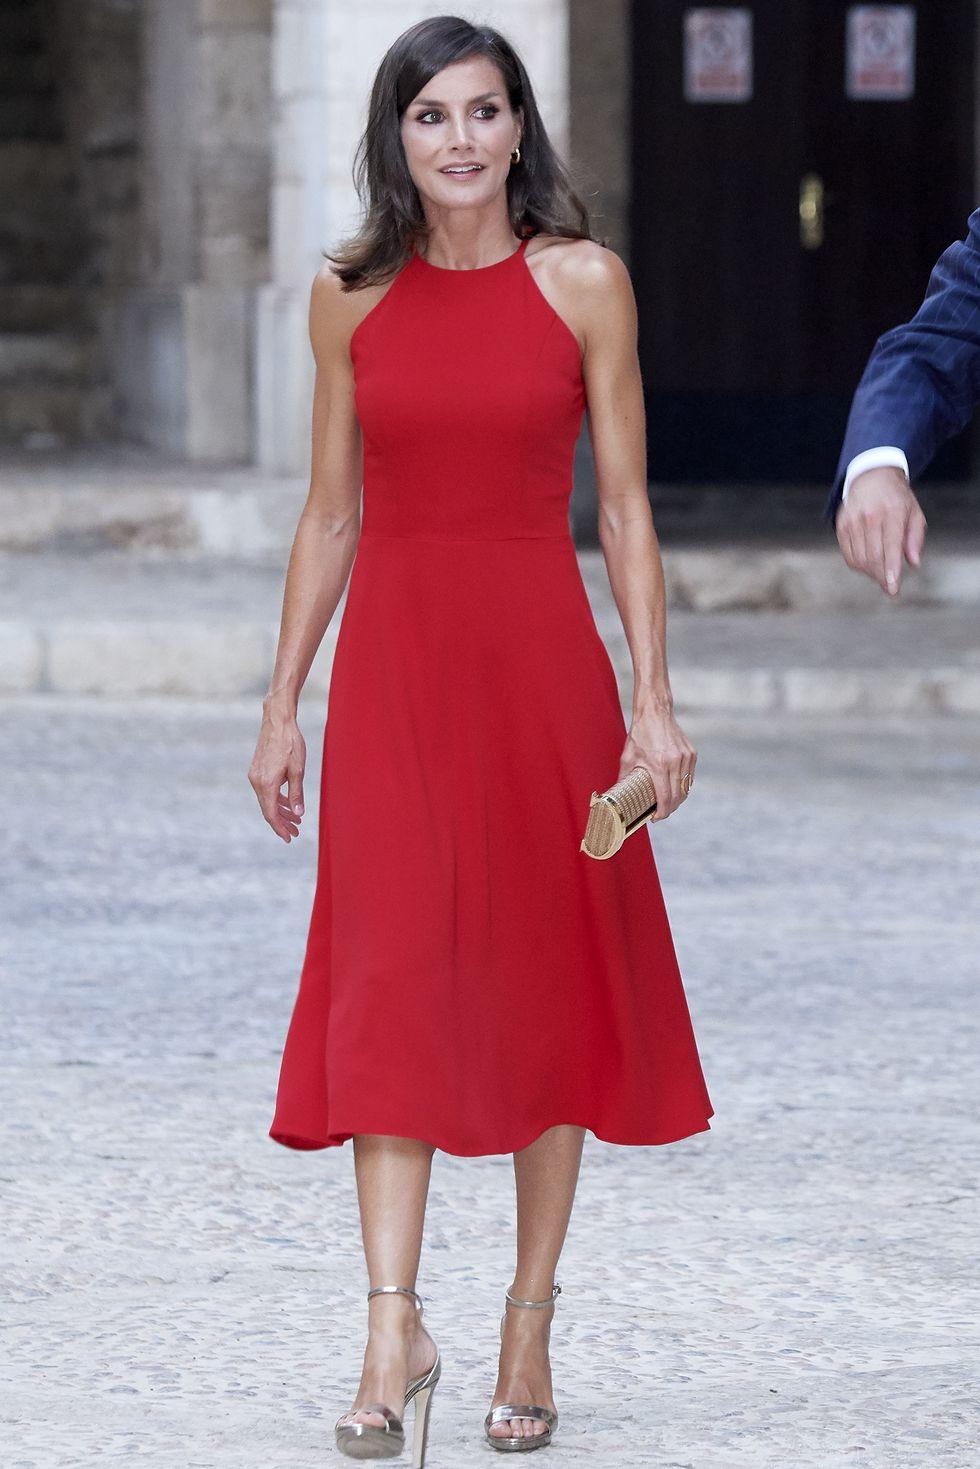 Letizia spanyol királyné